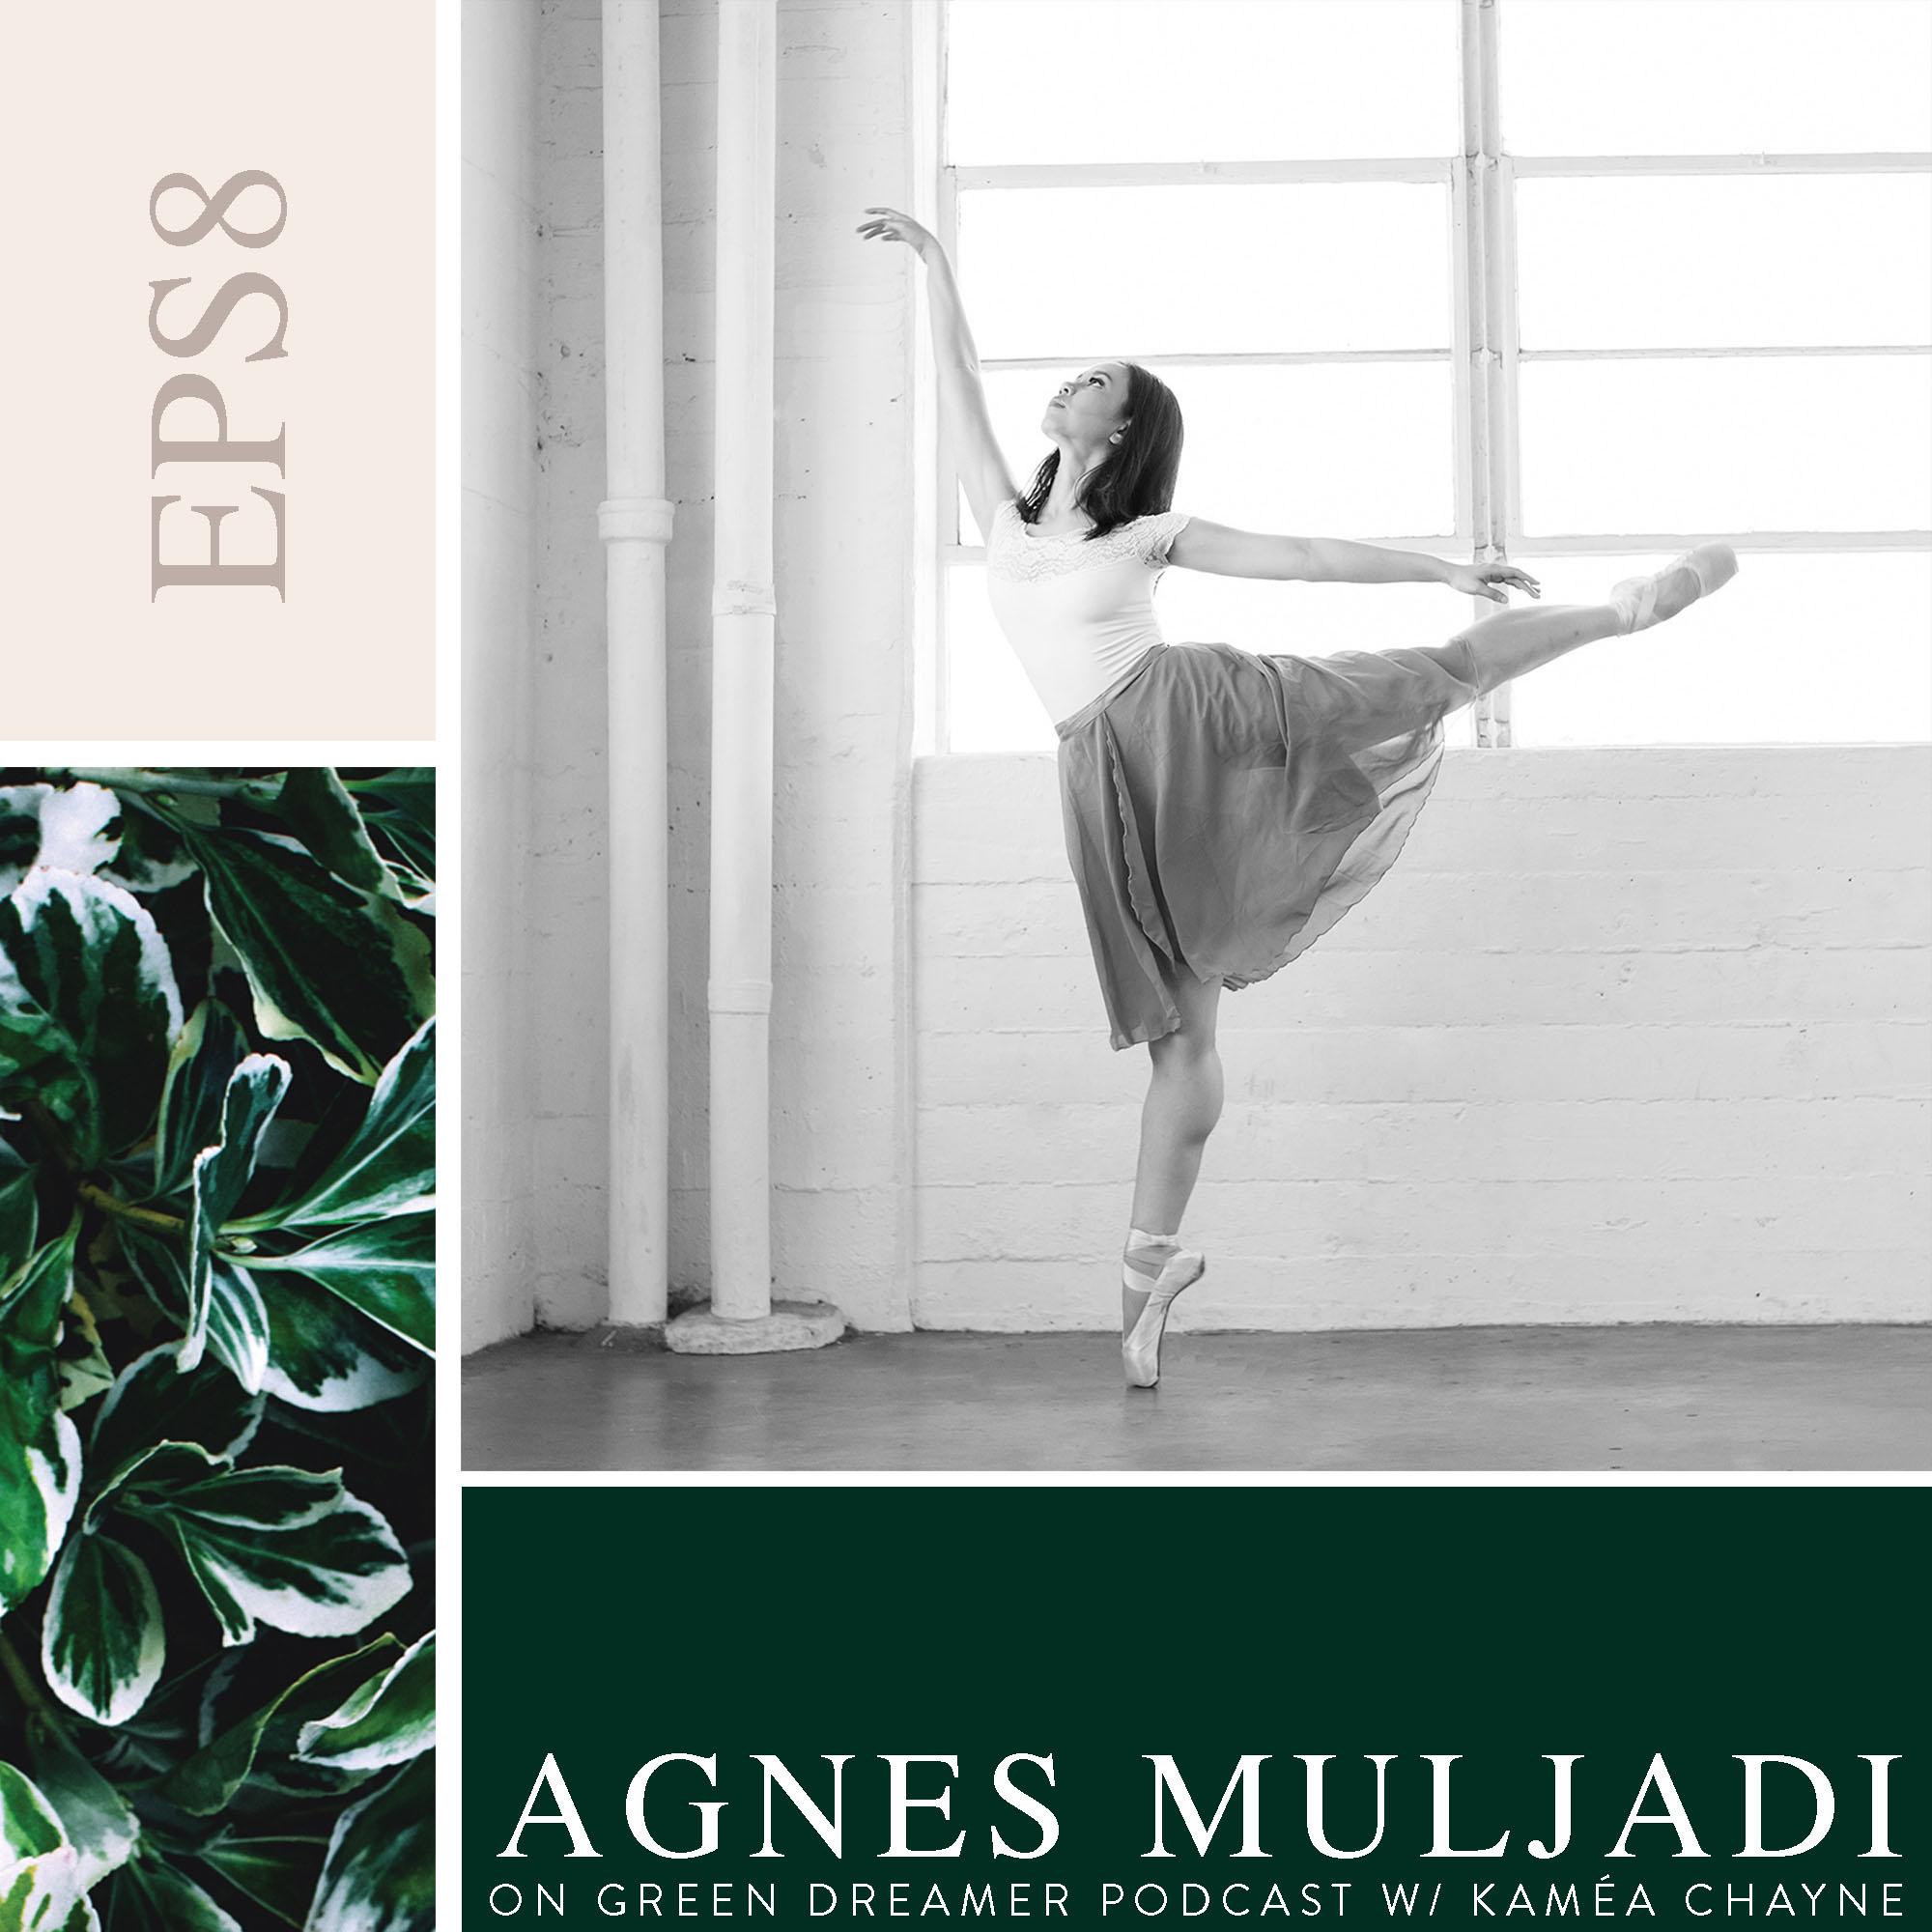 artsyagnes on Sustainability via Green Dreamer Podcast with Kaméa Chayne